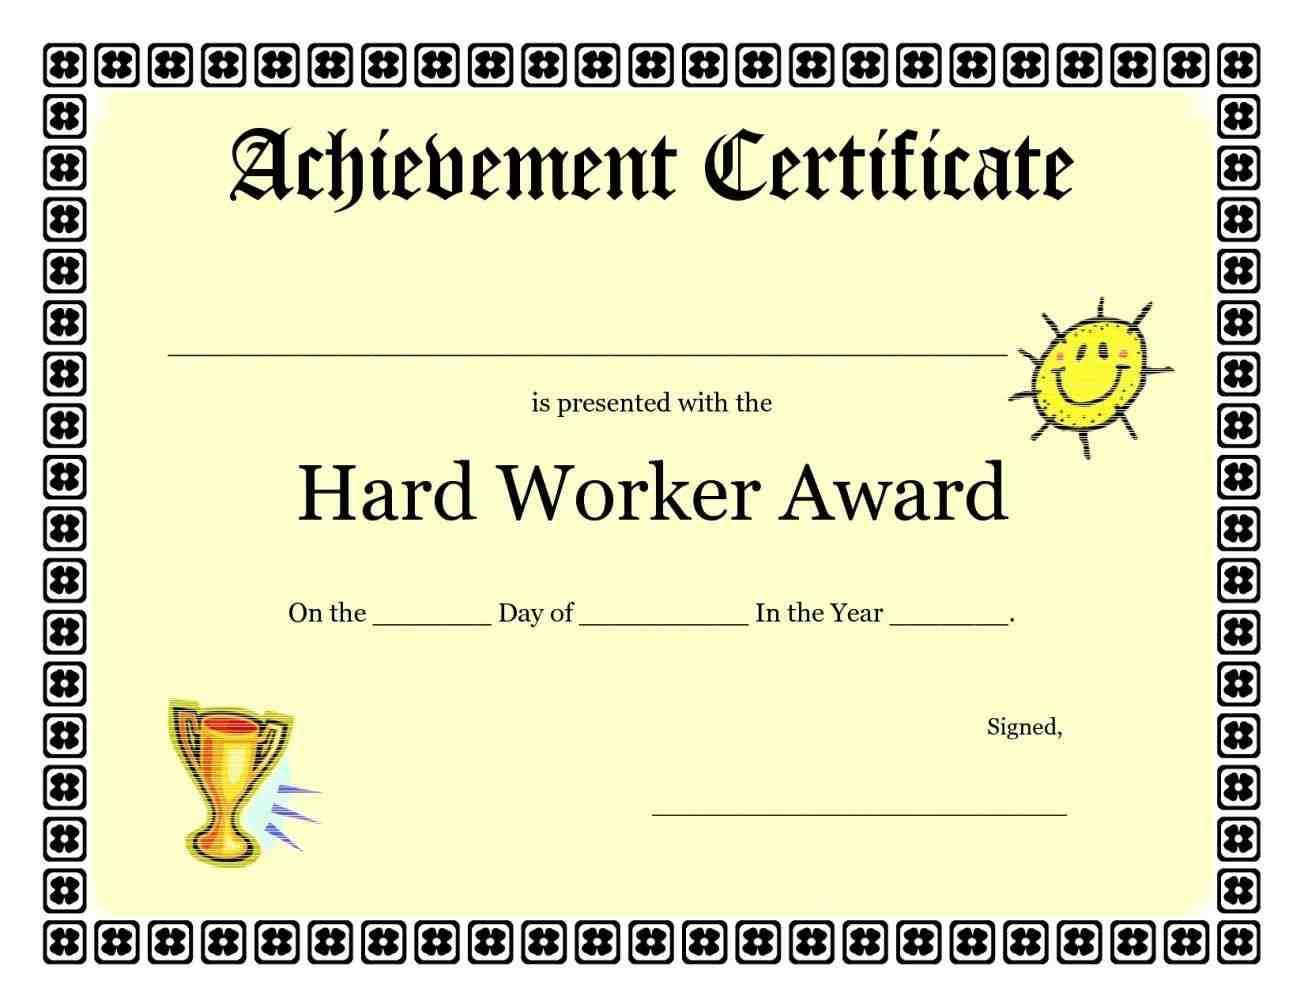 Award Certificates Templates Free